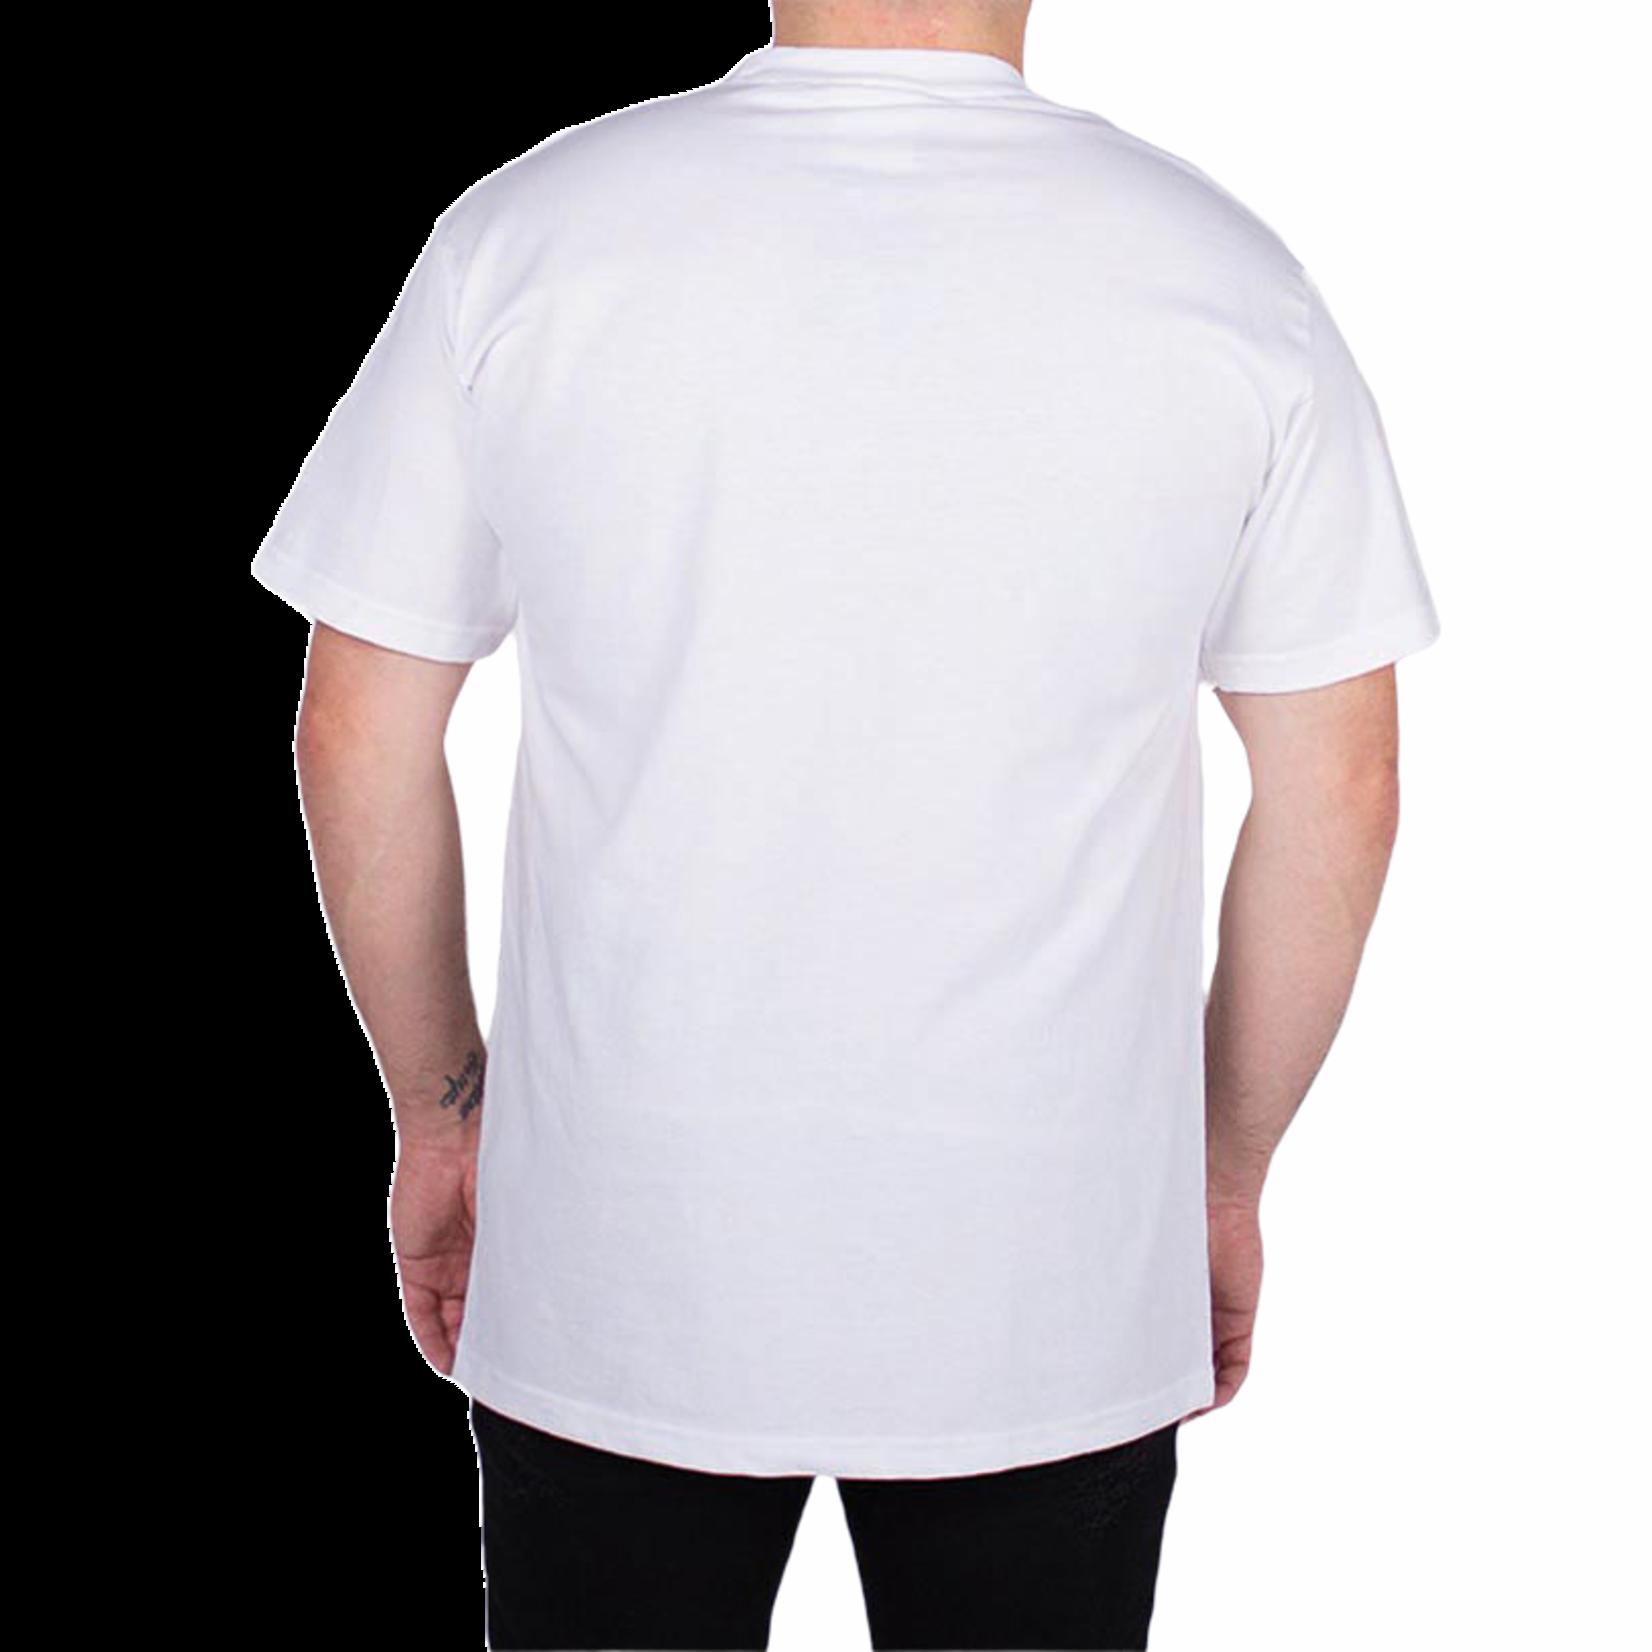 WLKN WLKN : Colored Goal Printed T-Shirt